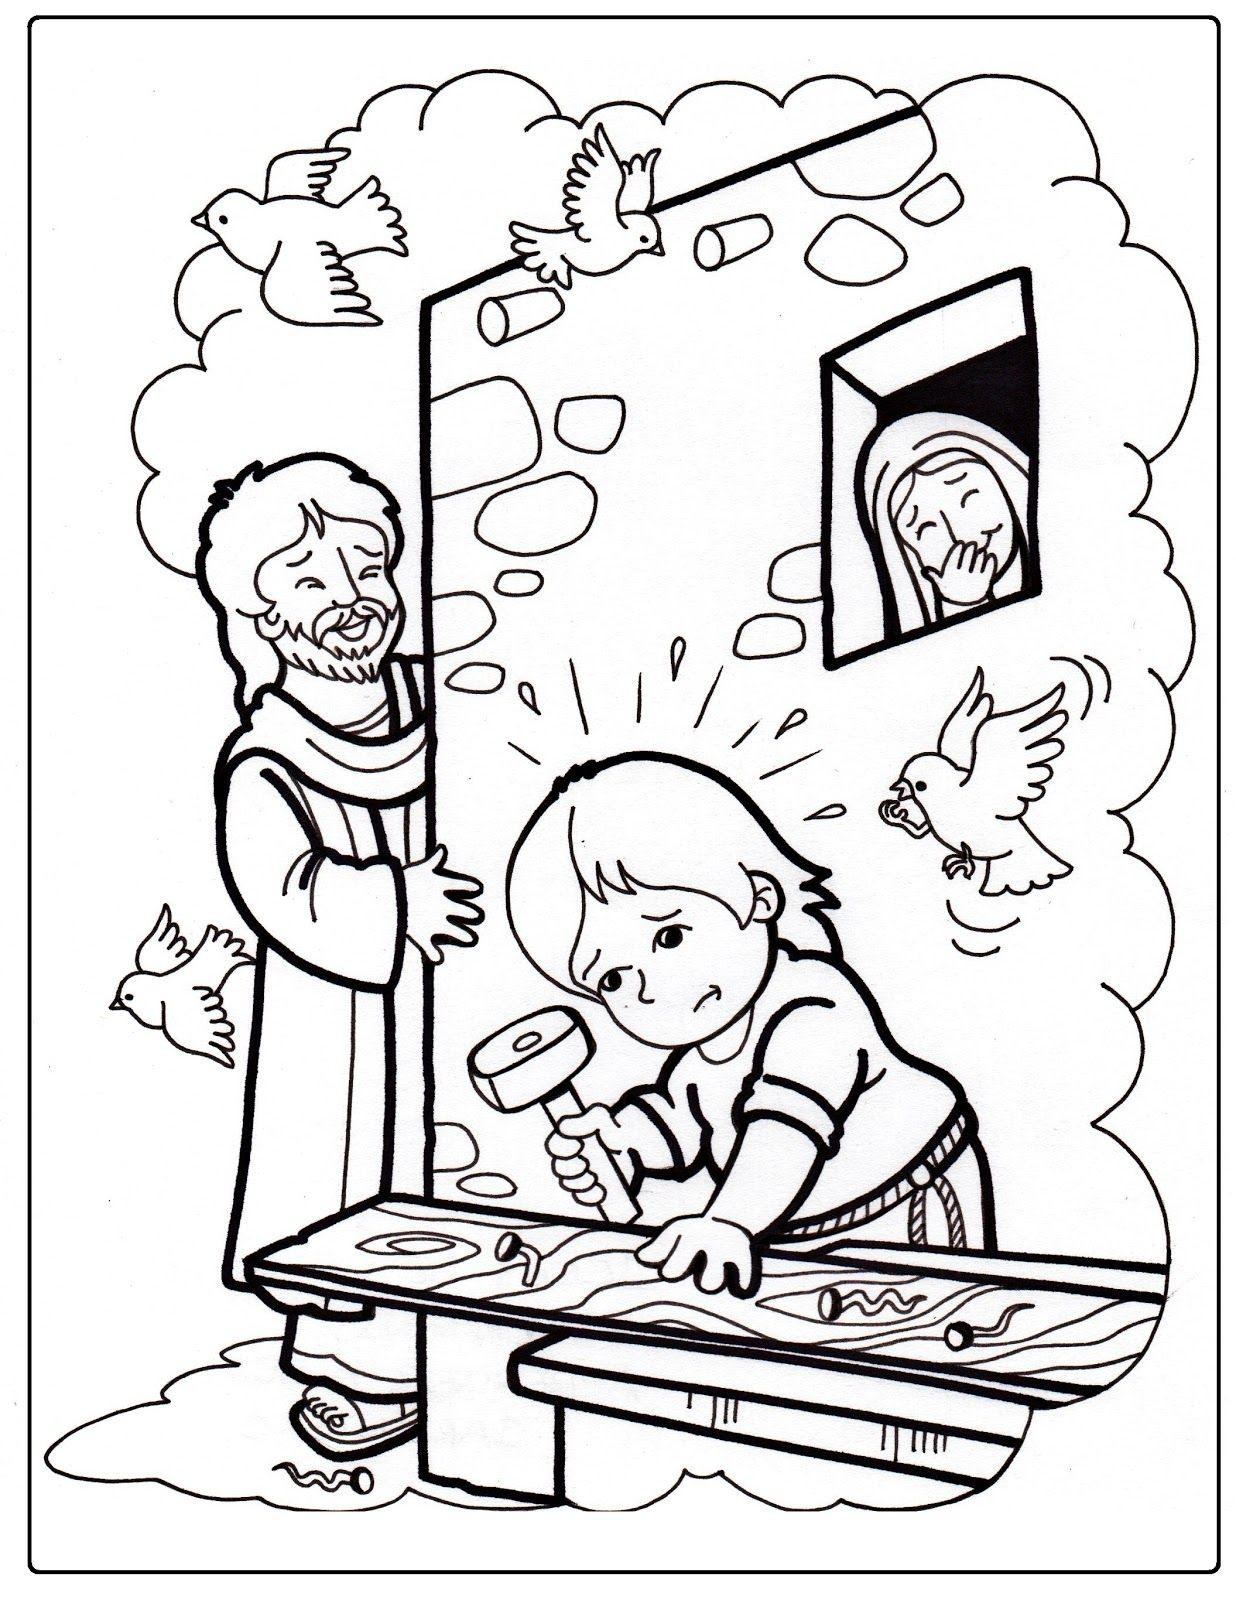 SGBlogosfera. Amigos de Jesús | catequesis | Pinterest | De jesus ...